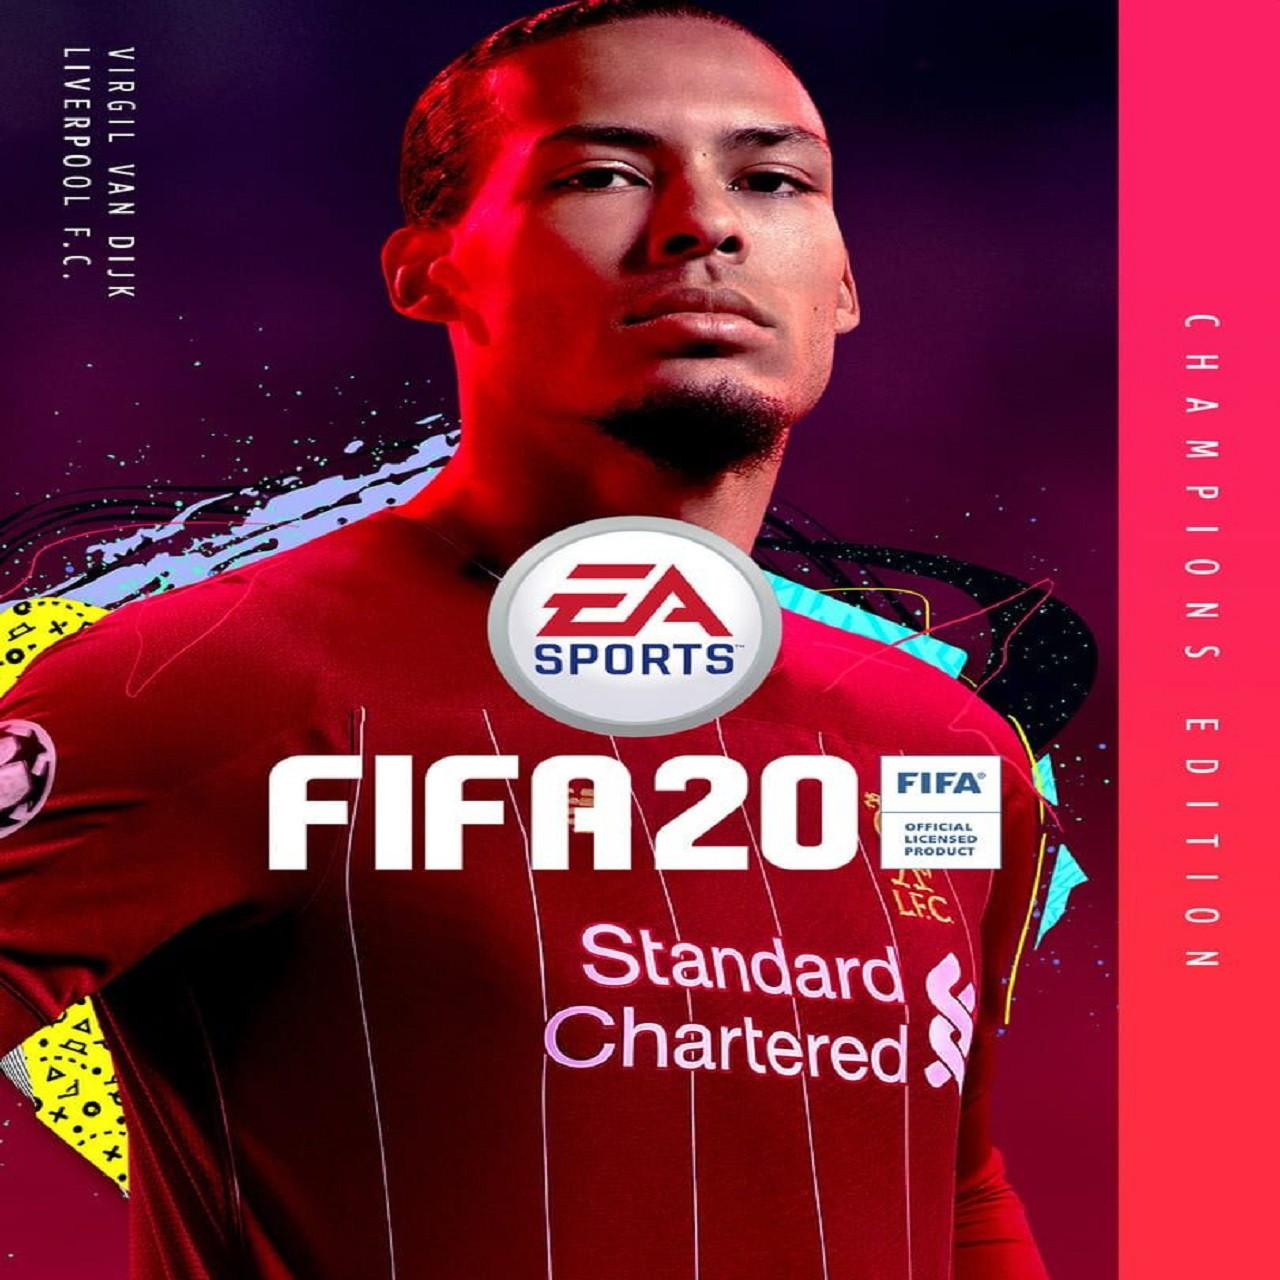 FIFA 20 Champions Edition PS4 (Код)